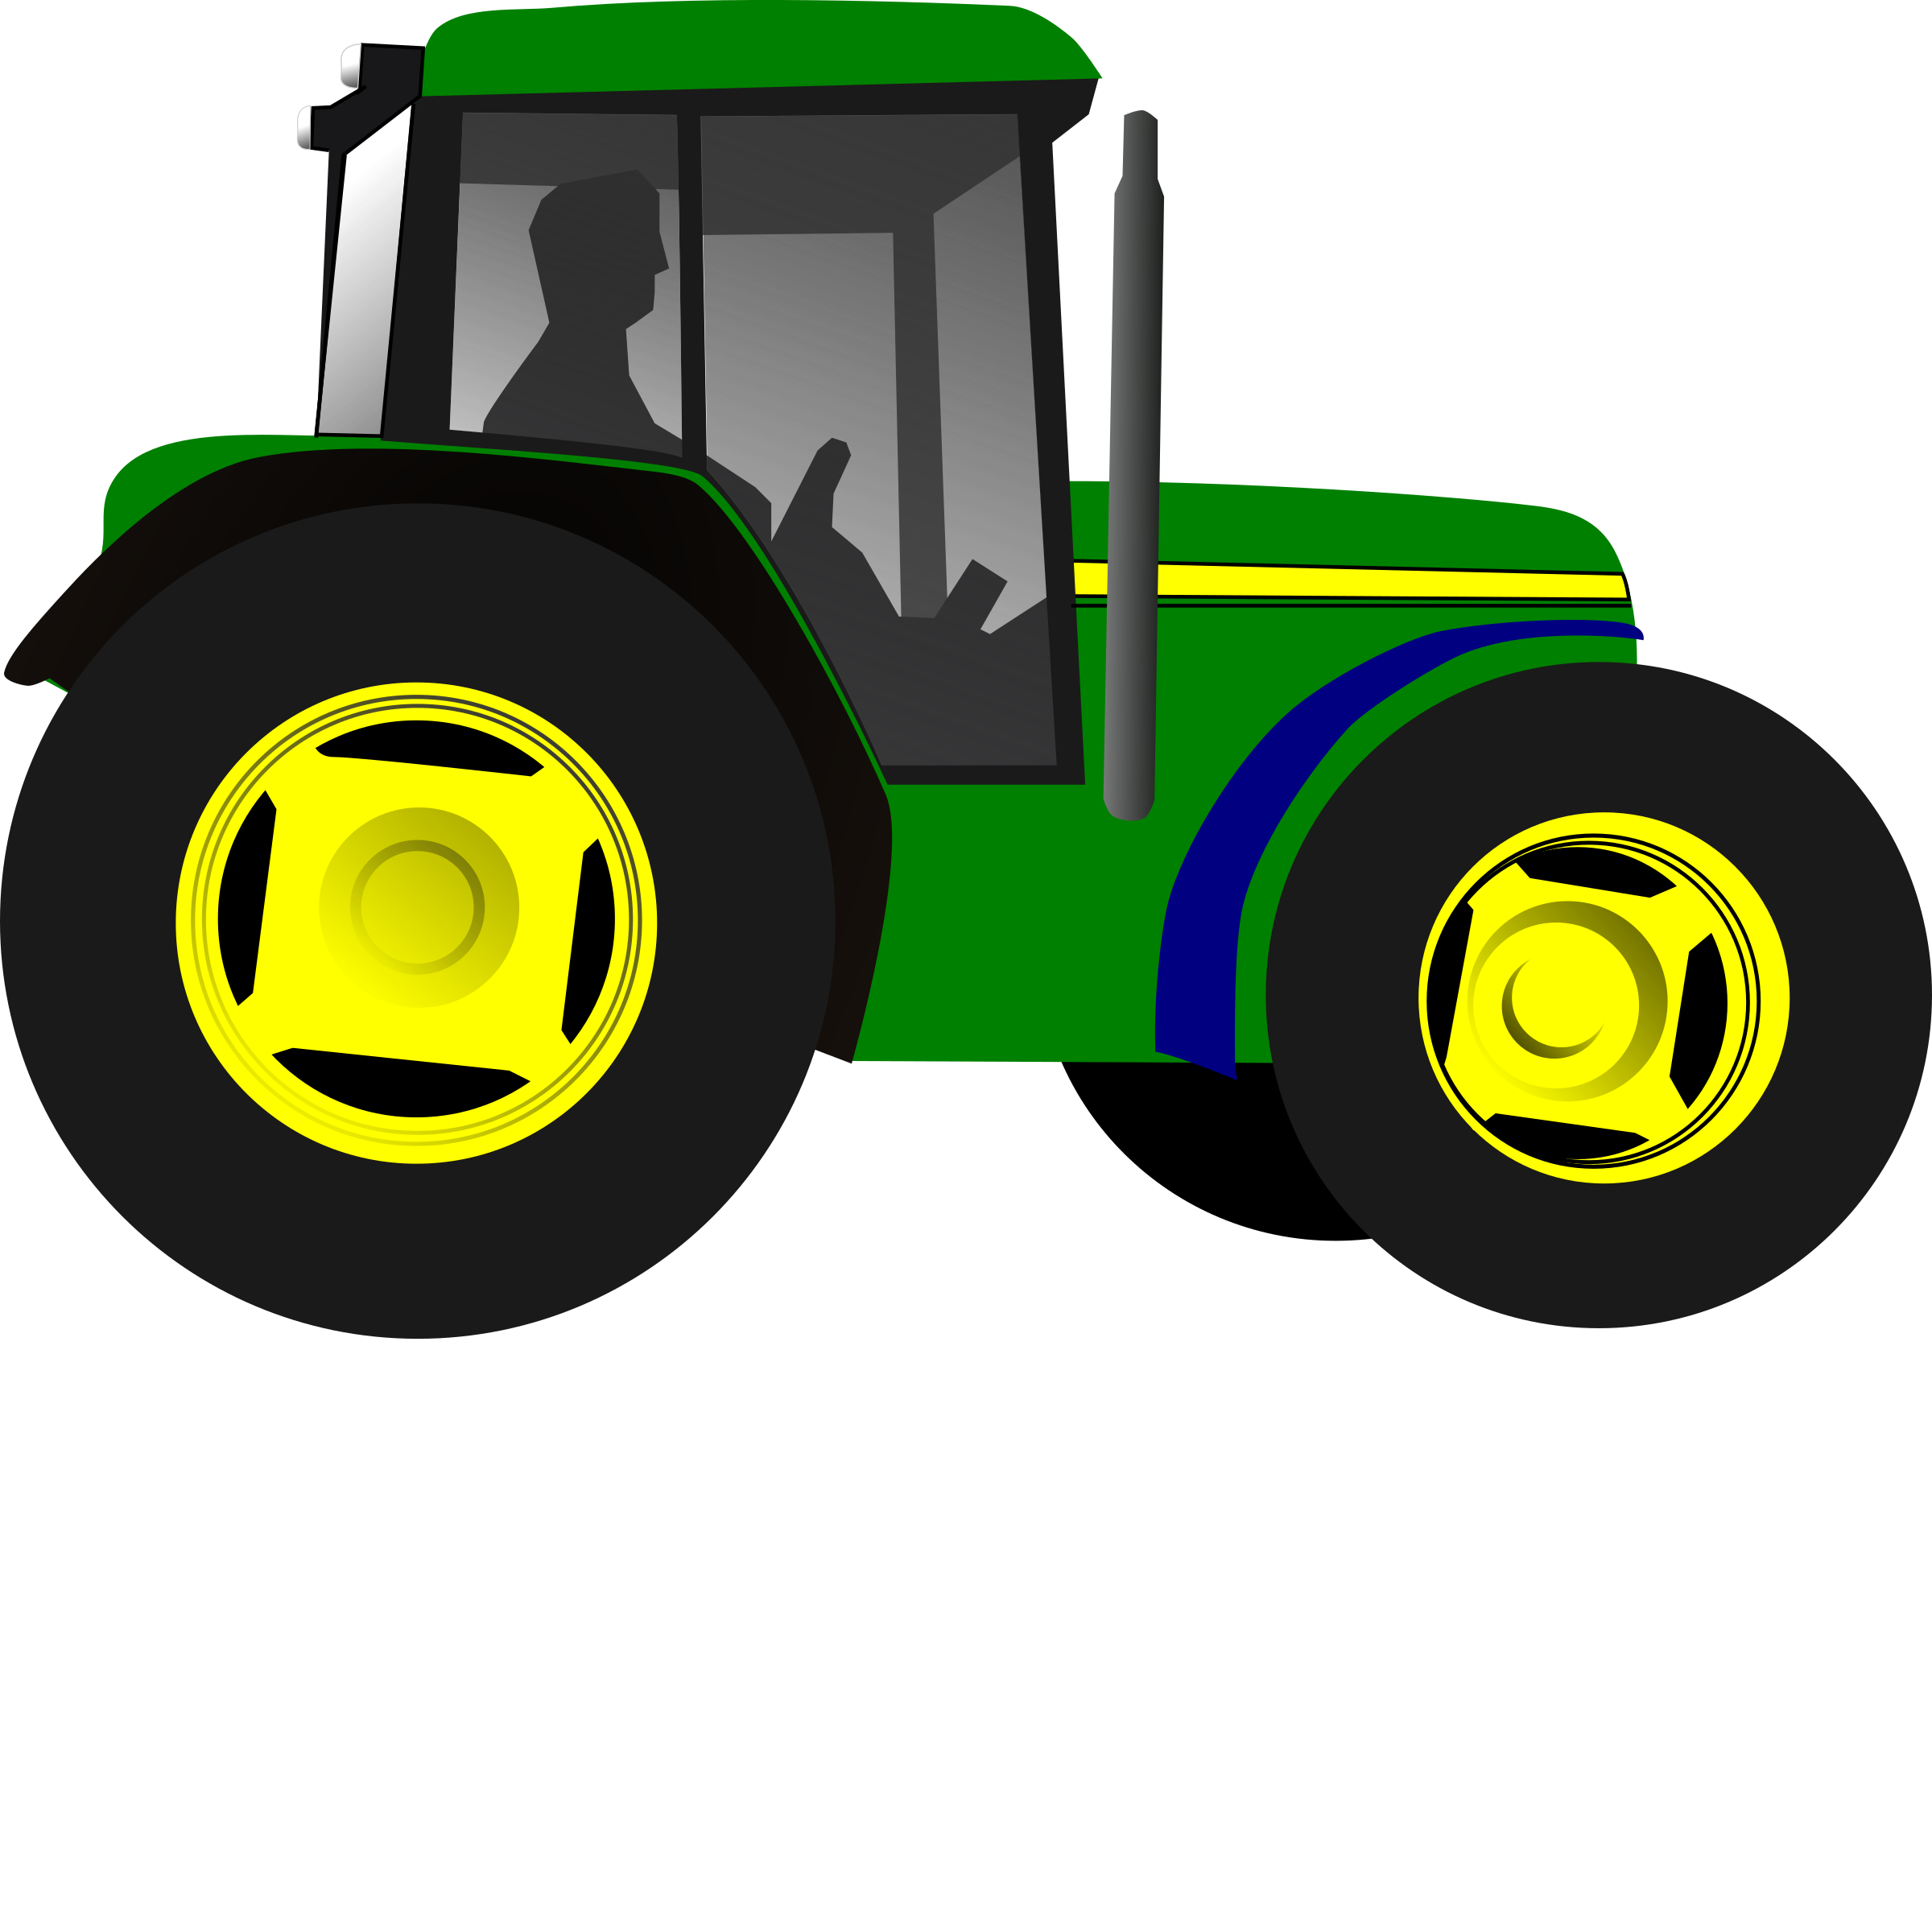 Wheel clipart tractor wheel. Little green big image